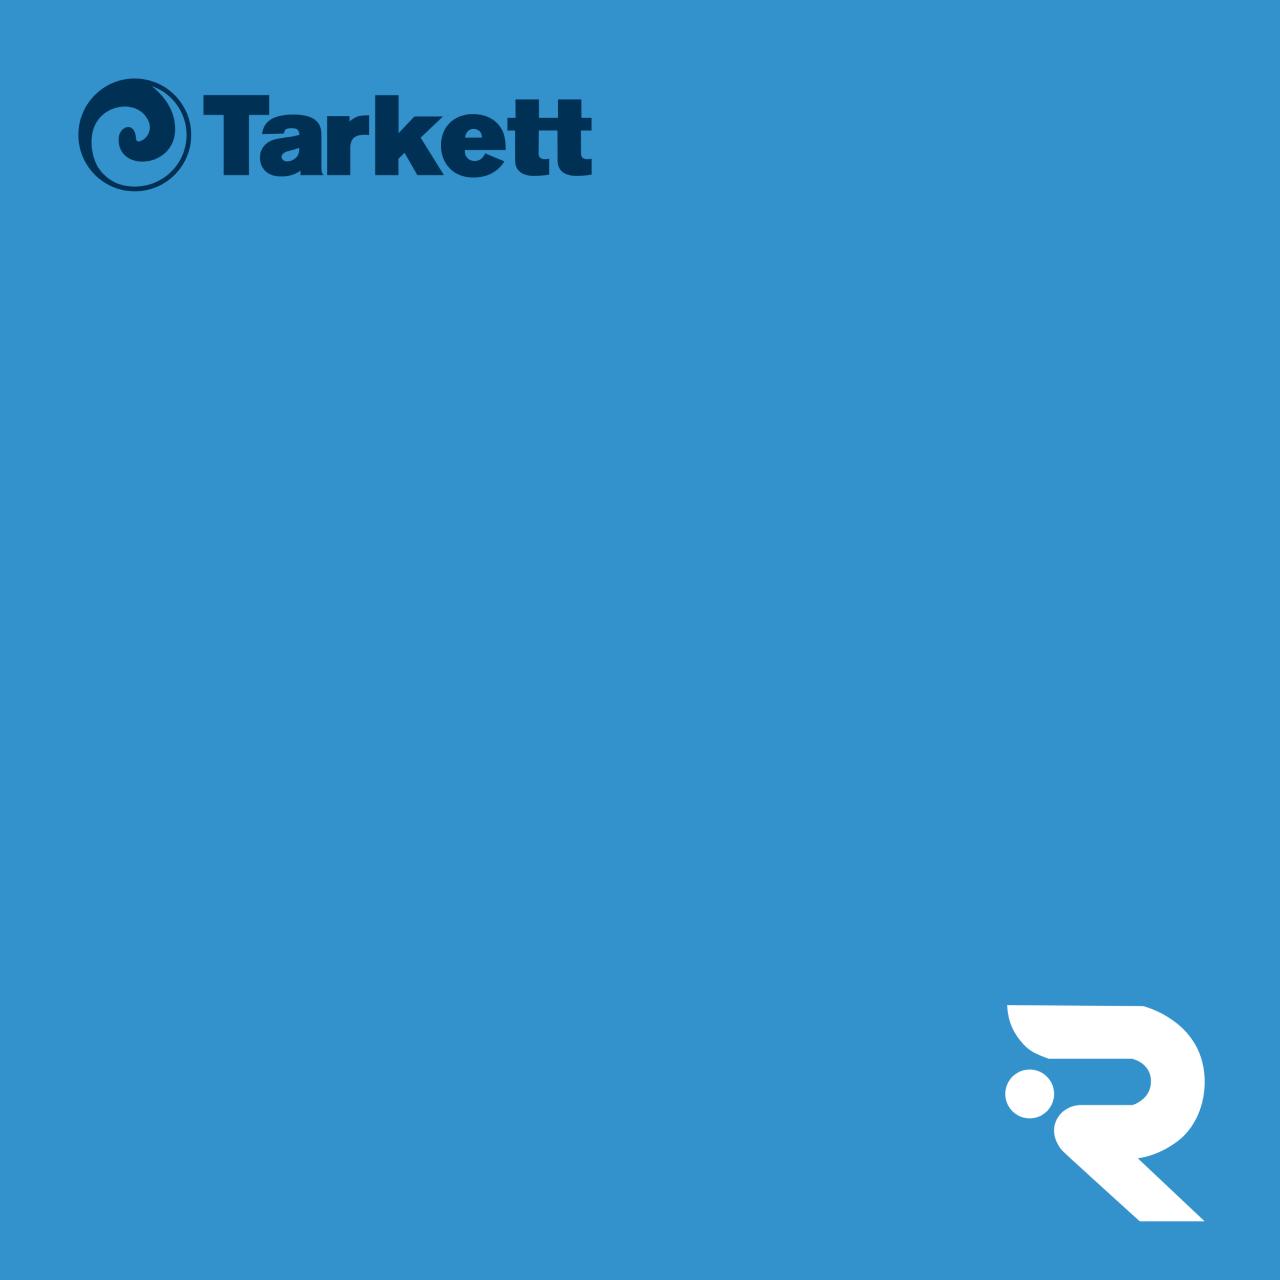 🏐 Спортивное покрытие Tarkett   SKY BLUE   OMNISPORTS V35   2 х 20.5 м